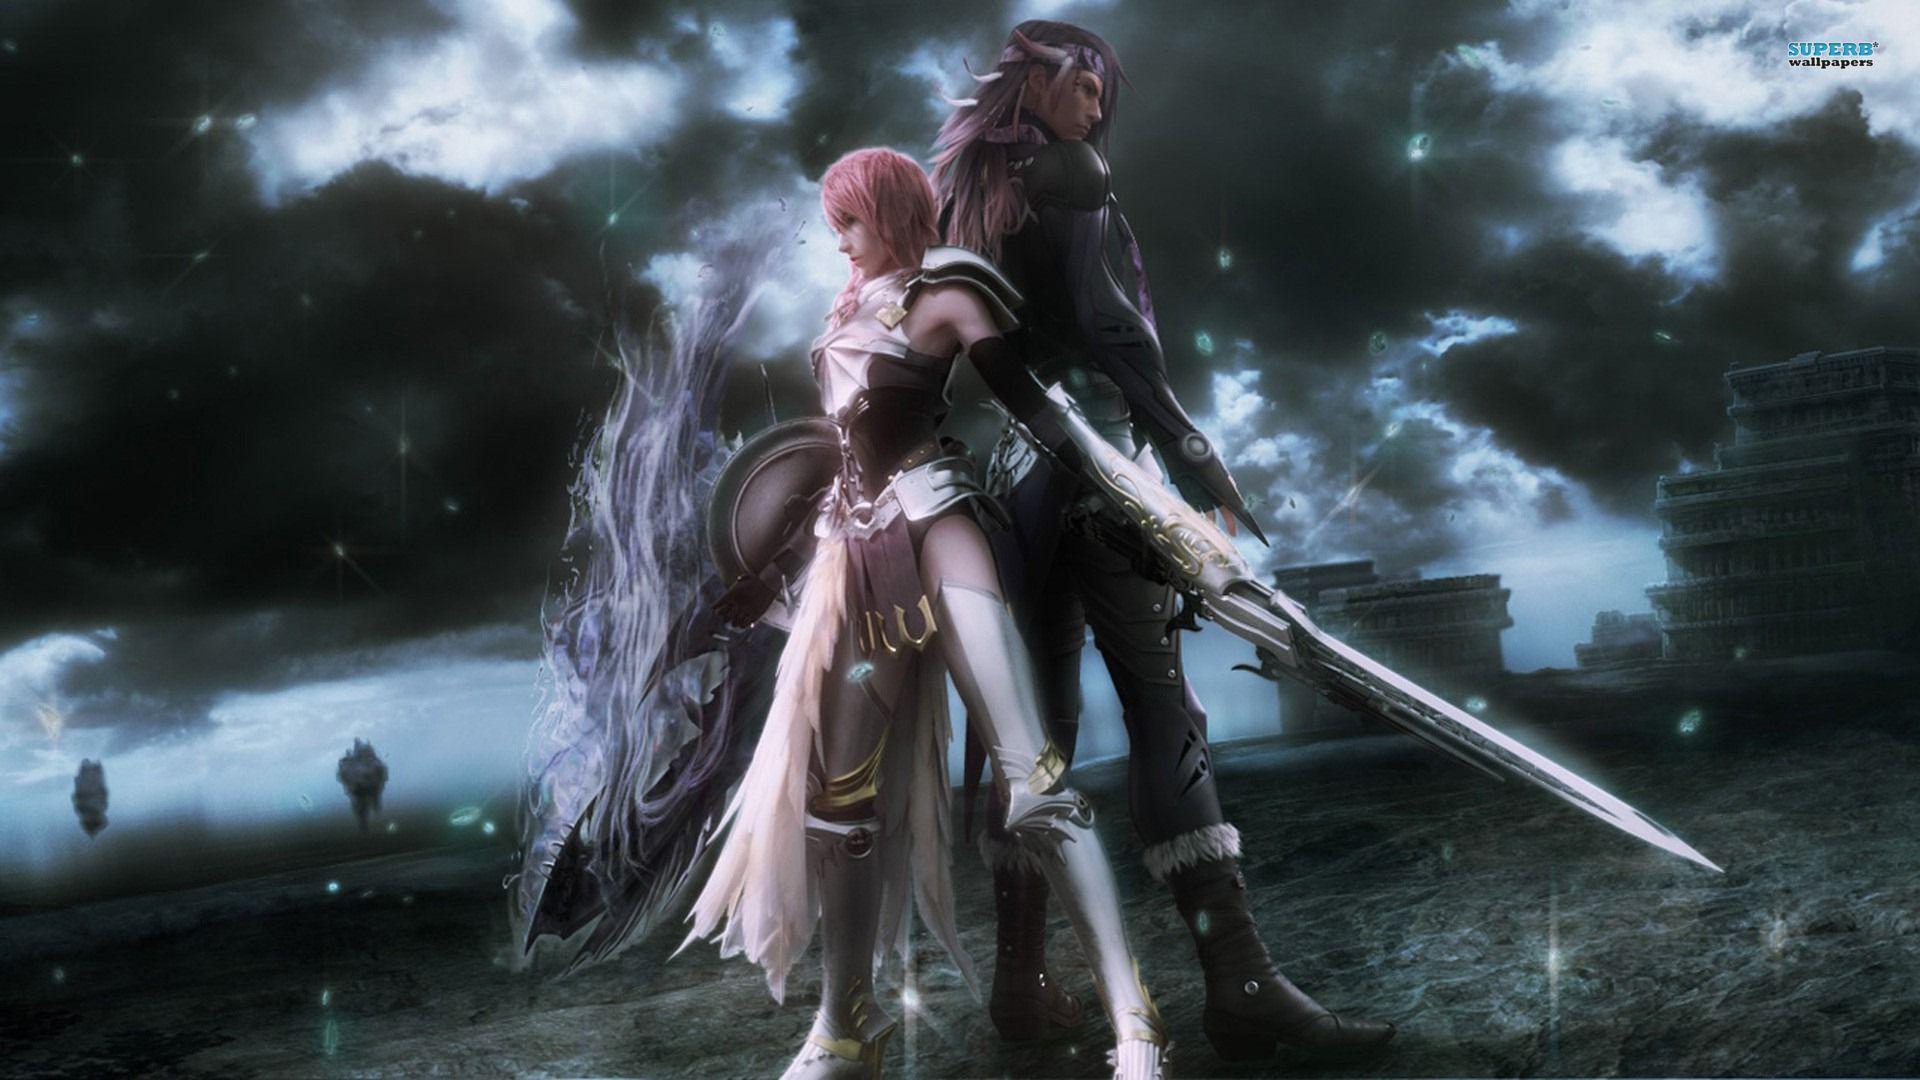 Final Fantasy Xiii 2 Wallpapers Wallpaper Cave